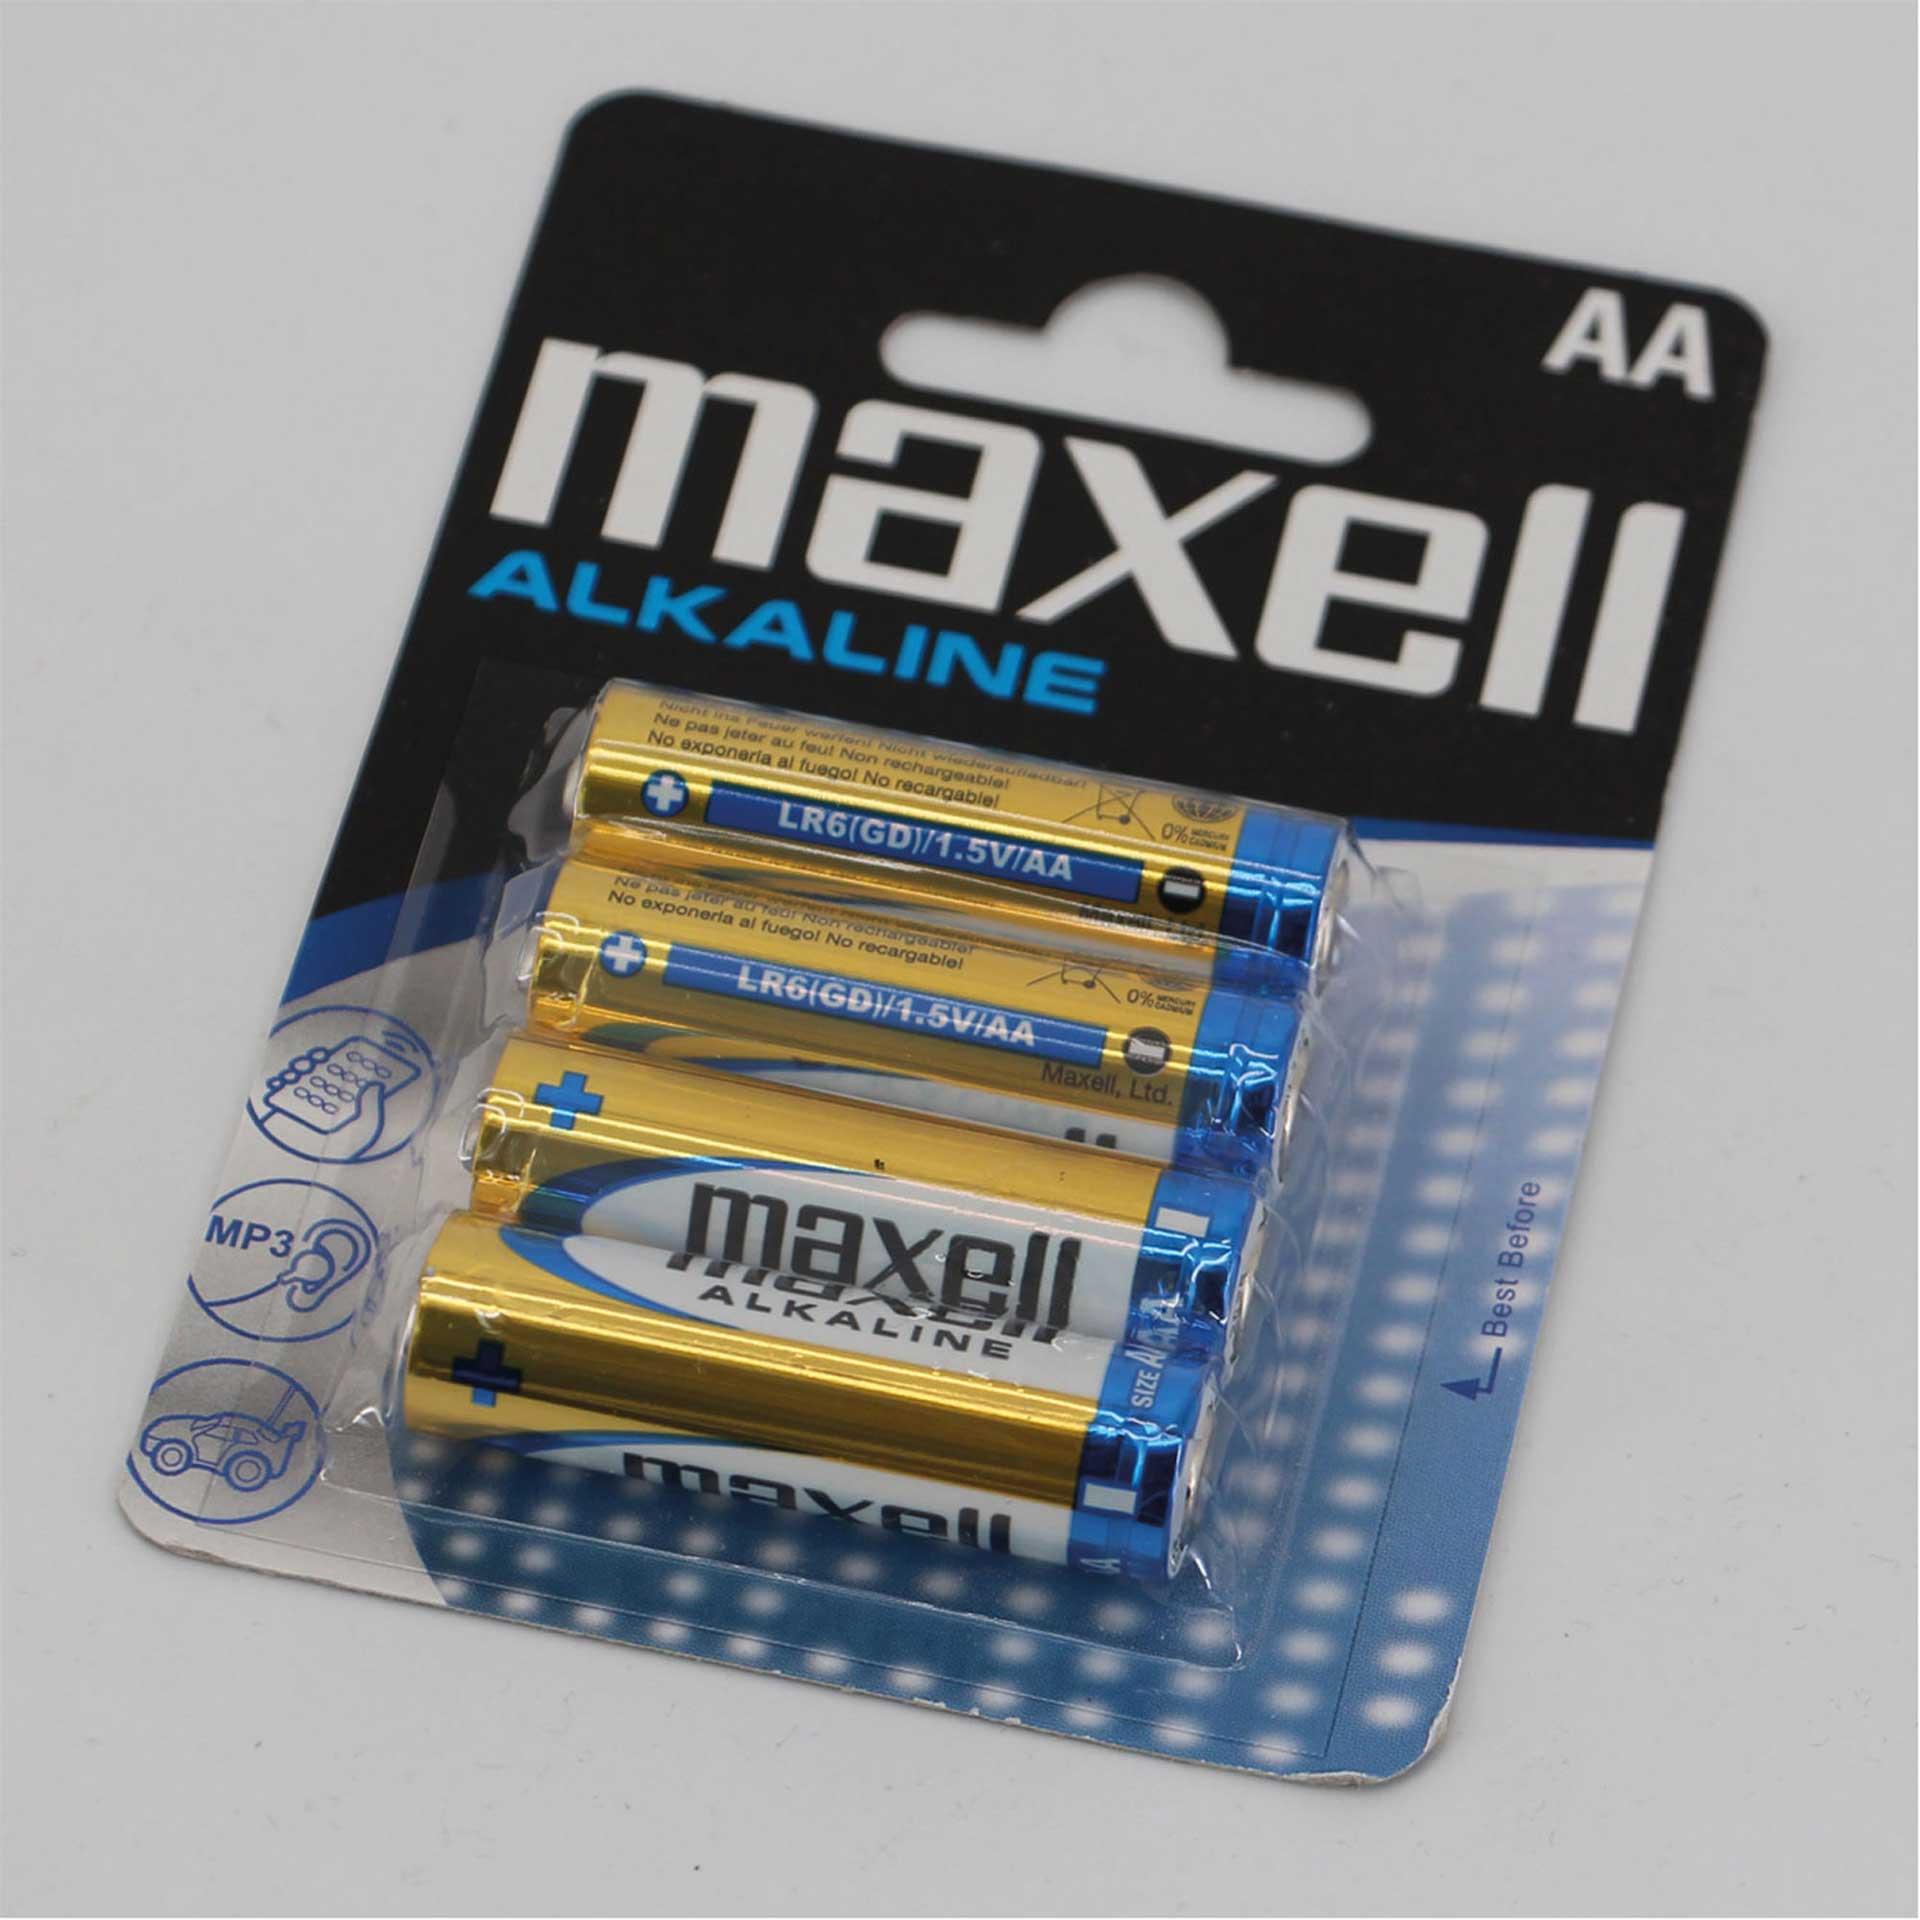 MAXELL MIGNON BATTERIE AA / LR6 1,5V 4STK.